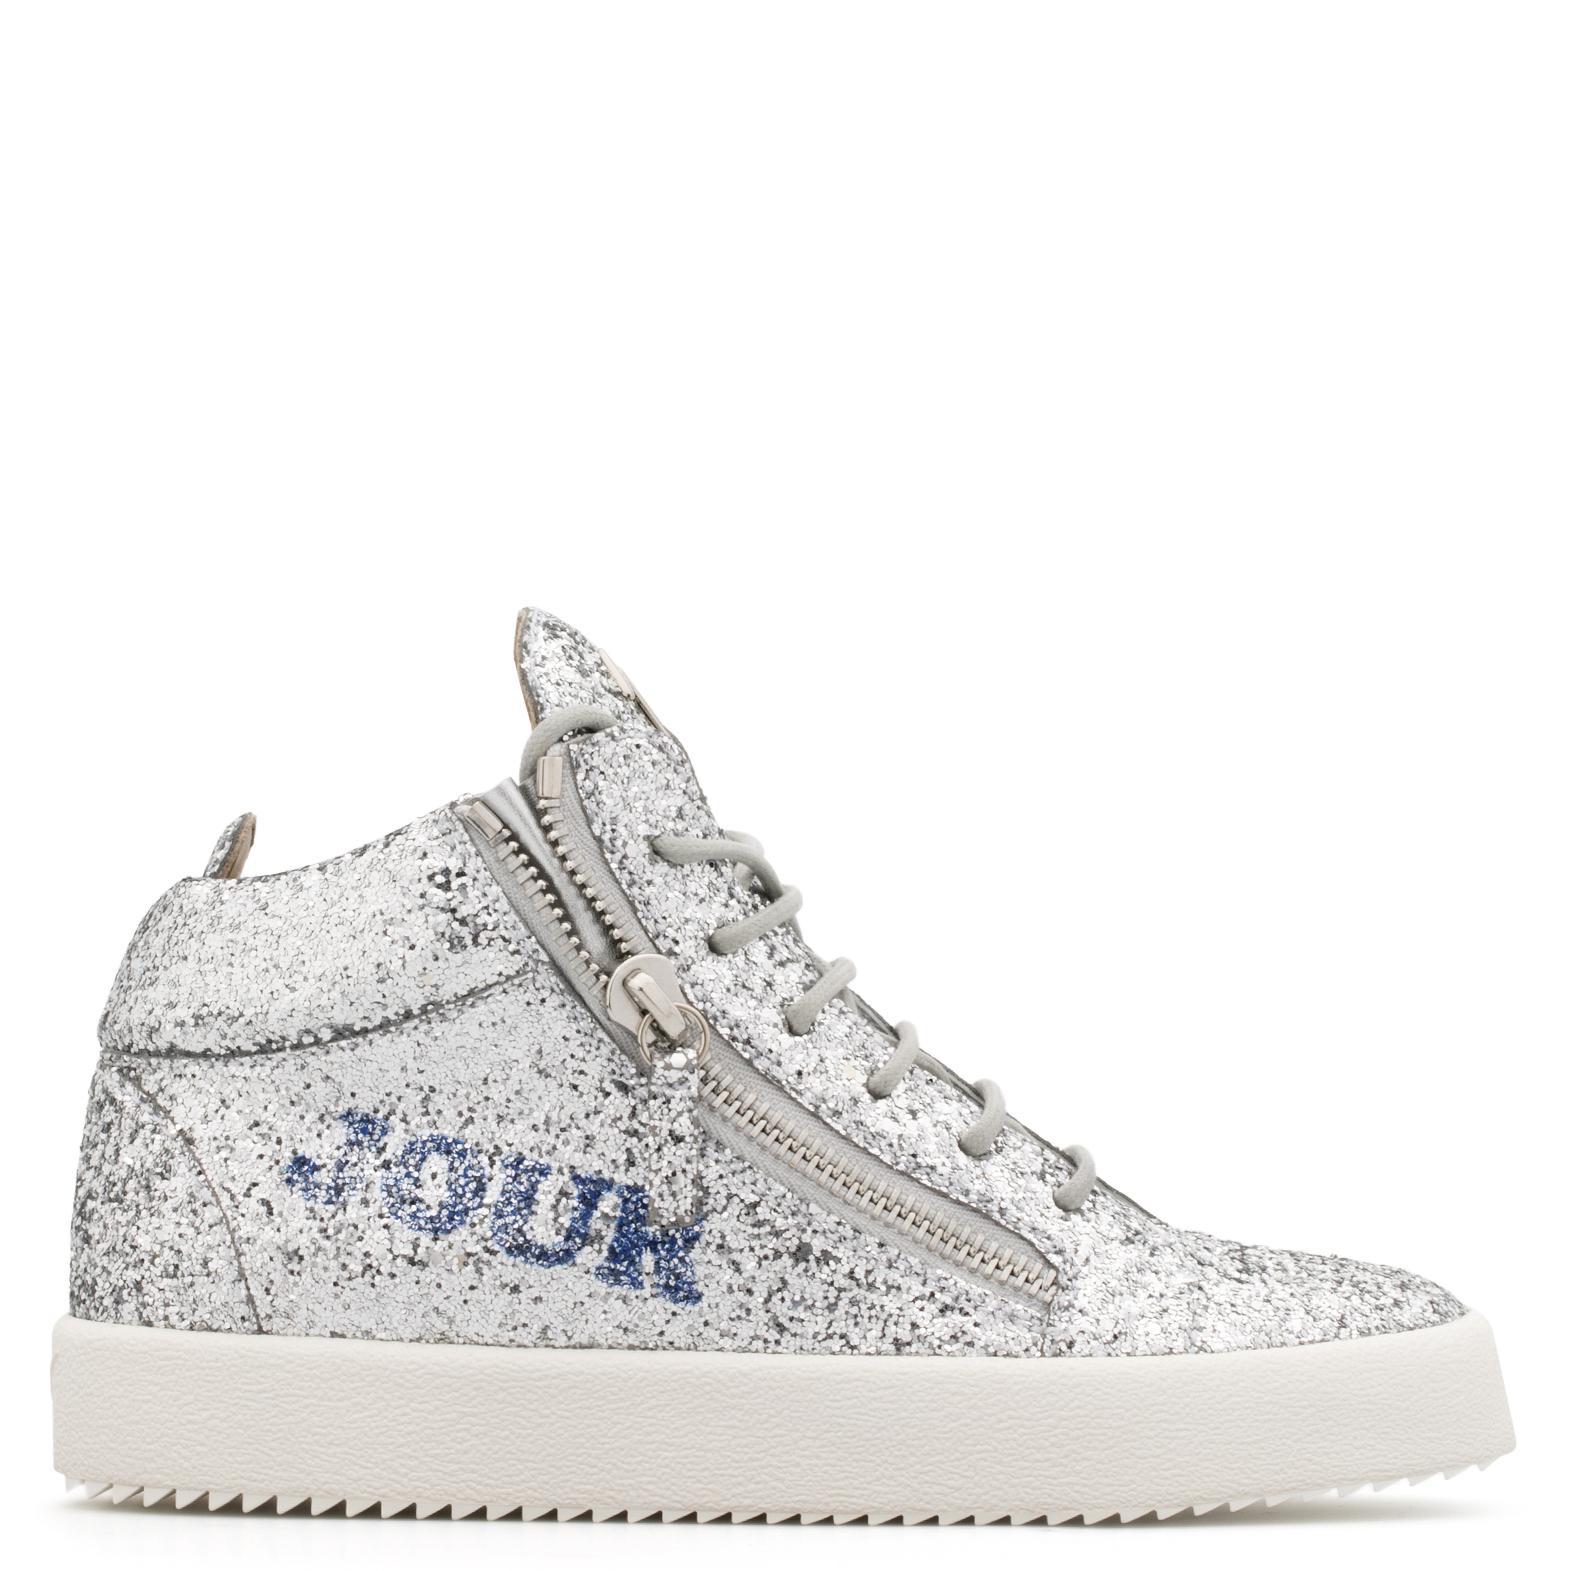 Giuseppe Zanotti Glitter low-top sneaker with 'Bonjour Nuit' motif BONJOUR NUIT Zx4K6OvmzQ